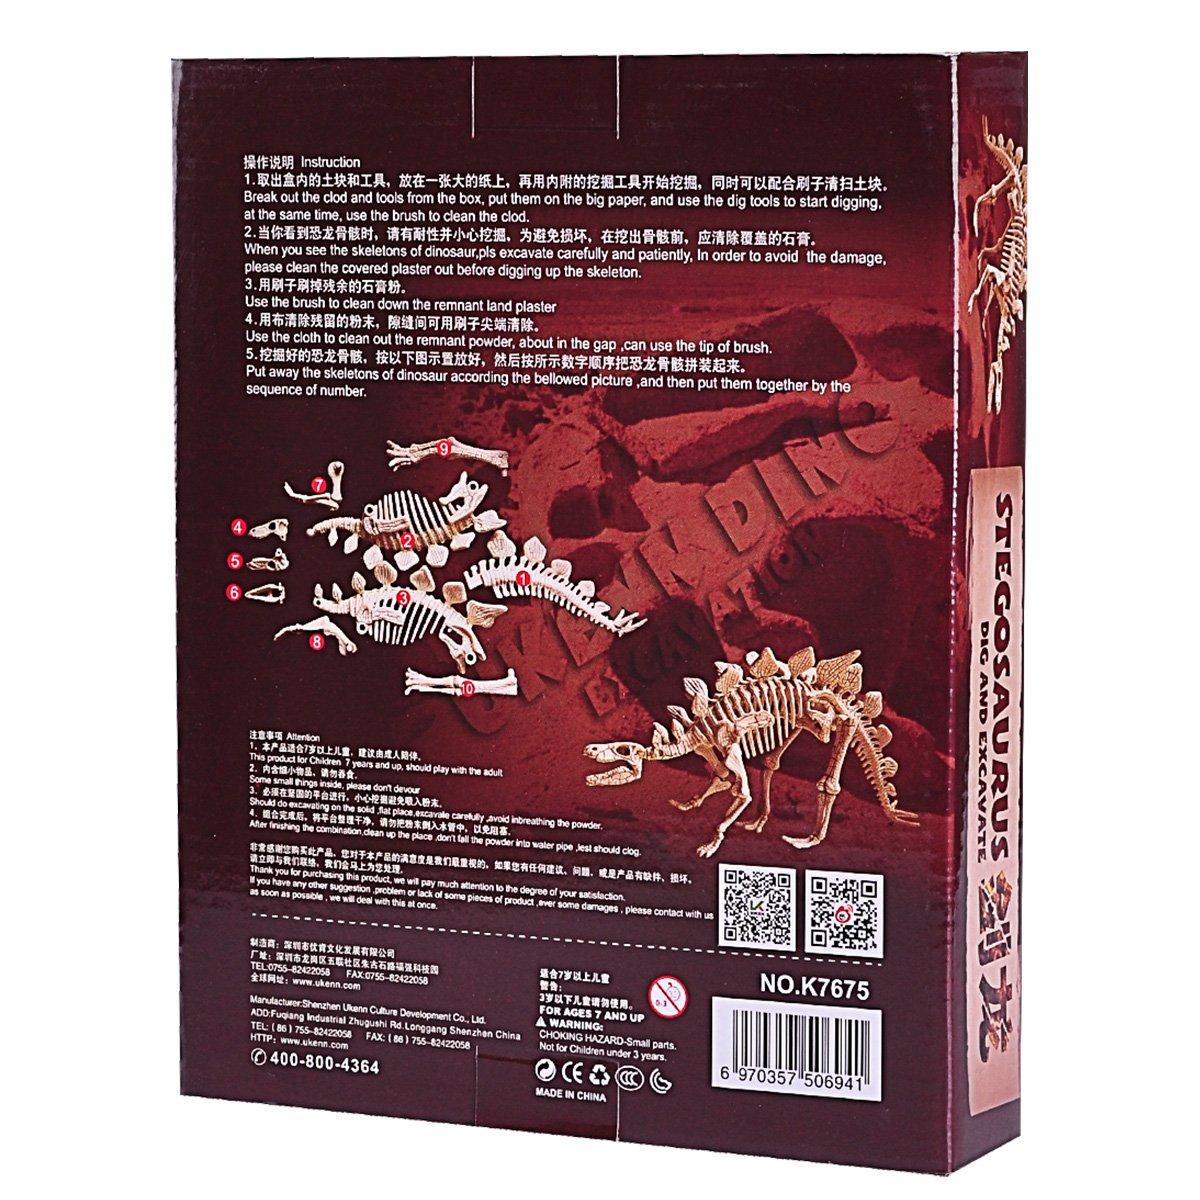 Dinosaur Excavation Kit - 6 Type Dinosaur Dig Kit Toy (Stegosaurus)